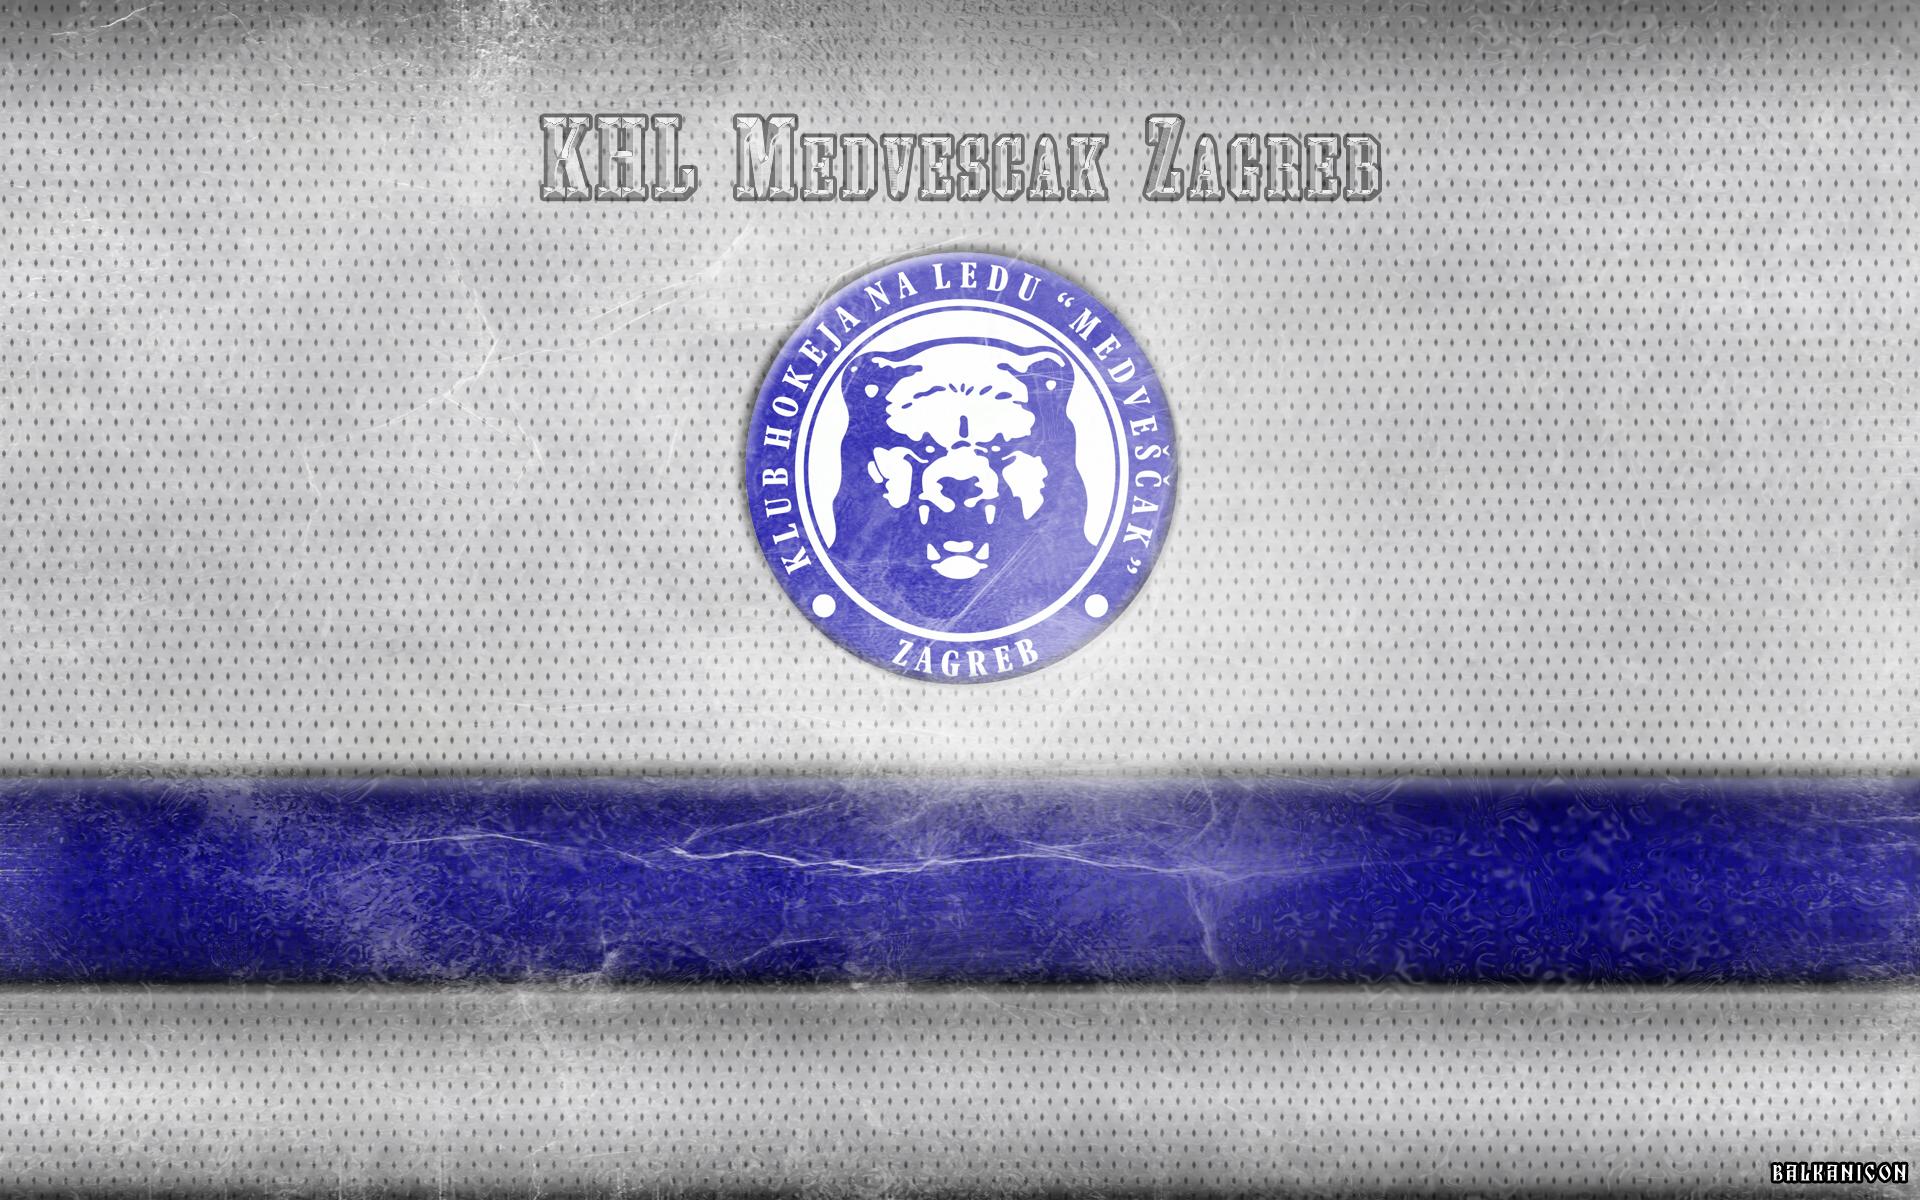 KHL Medvescak Zagreb wallpaper by Balkanicon 1920x1200